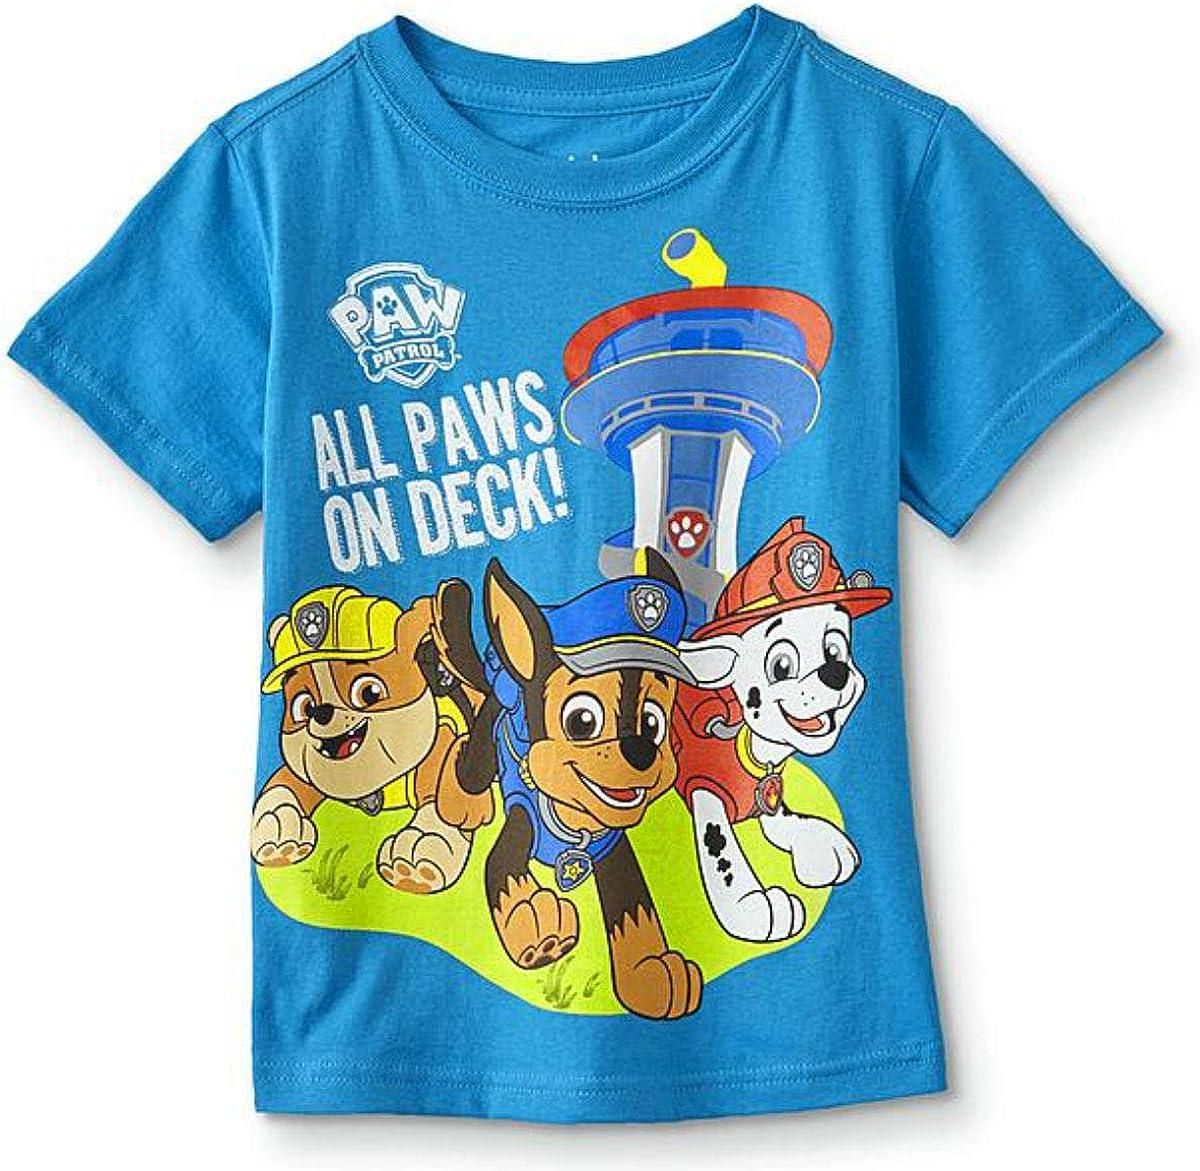 Nickelodeon Paw Patrol Toddler Boys' All Paws On Deck Tee Shirt